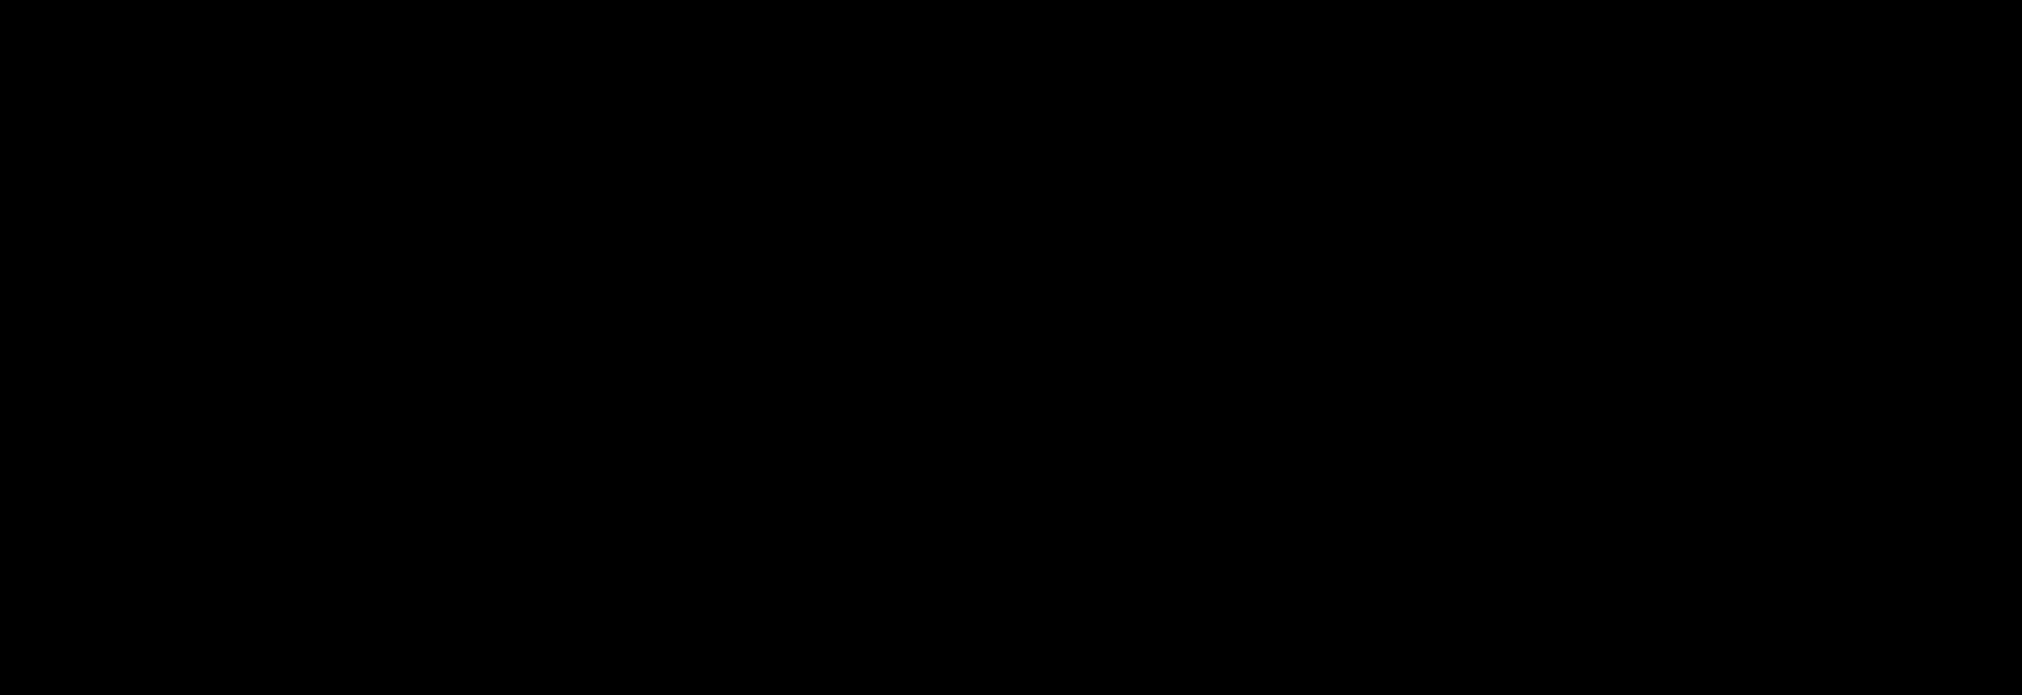 Alfuzosin-d6 hydrochloride